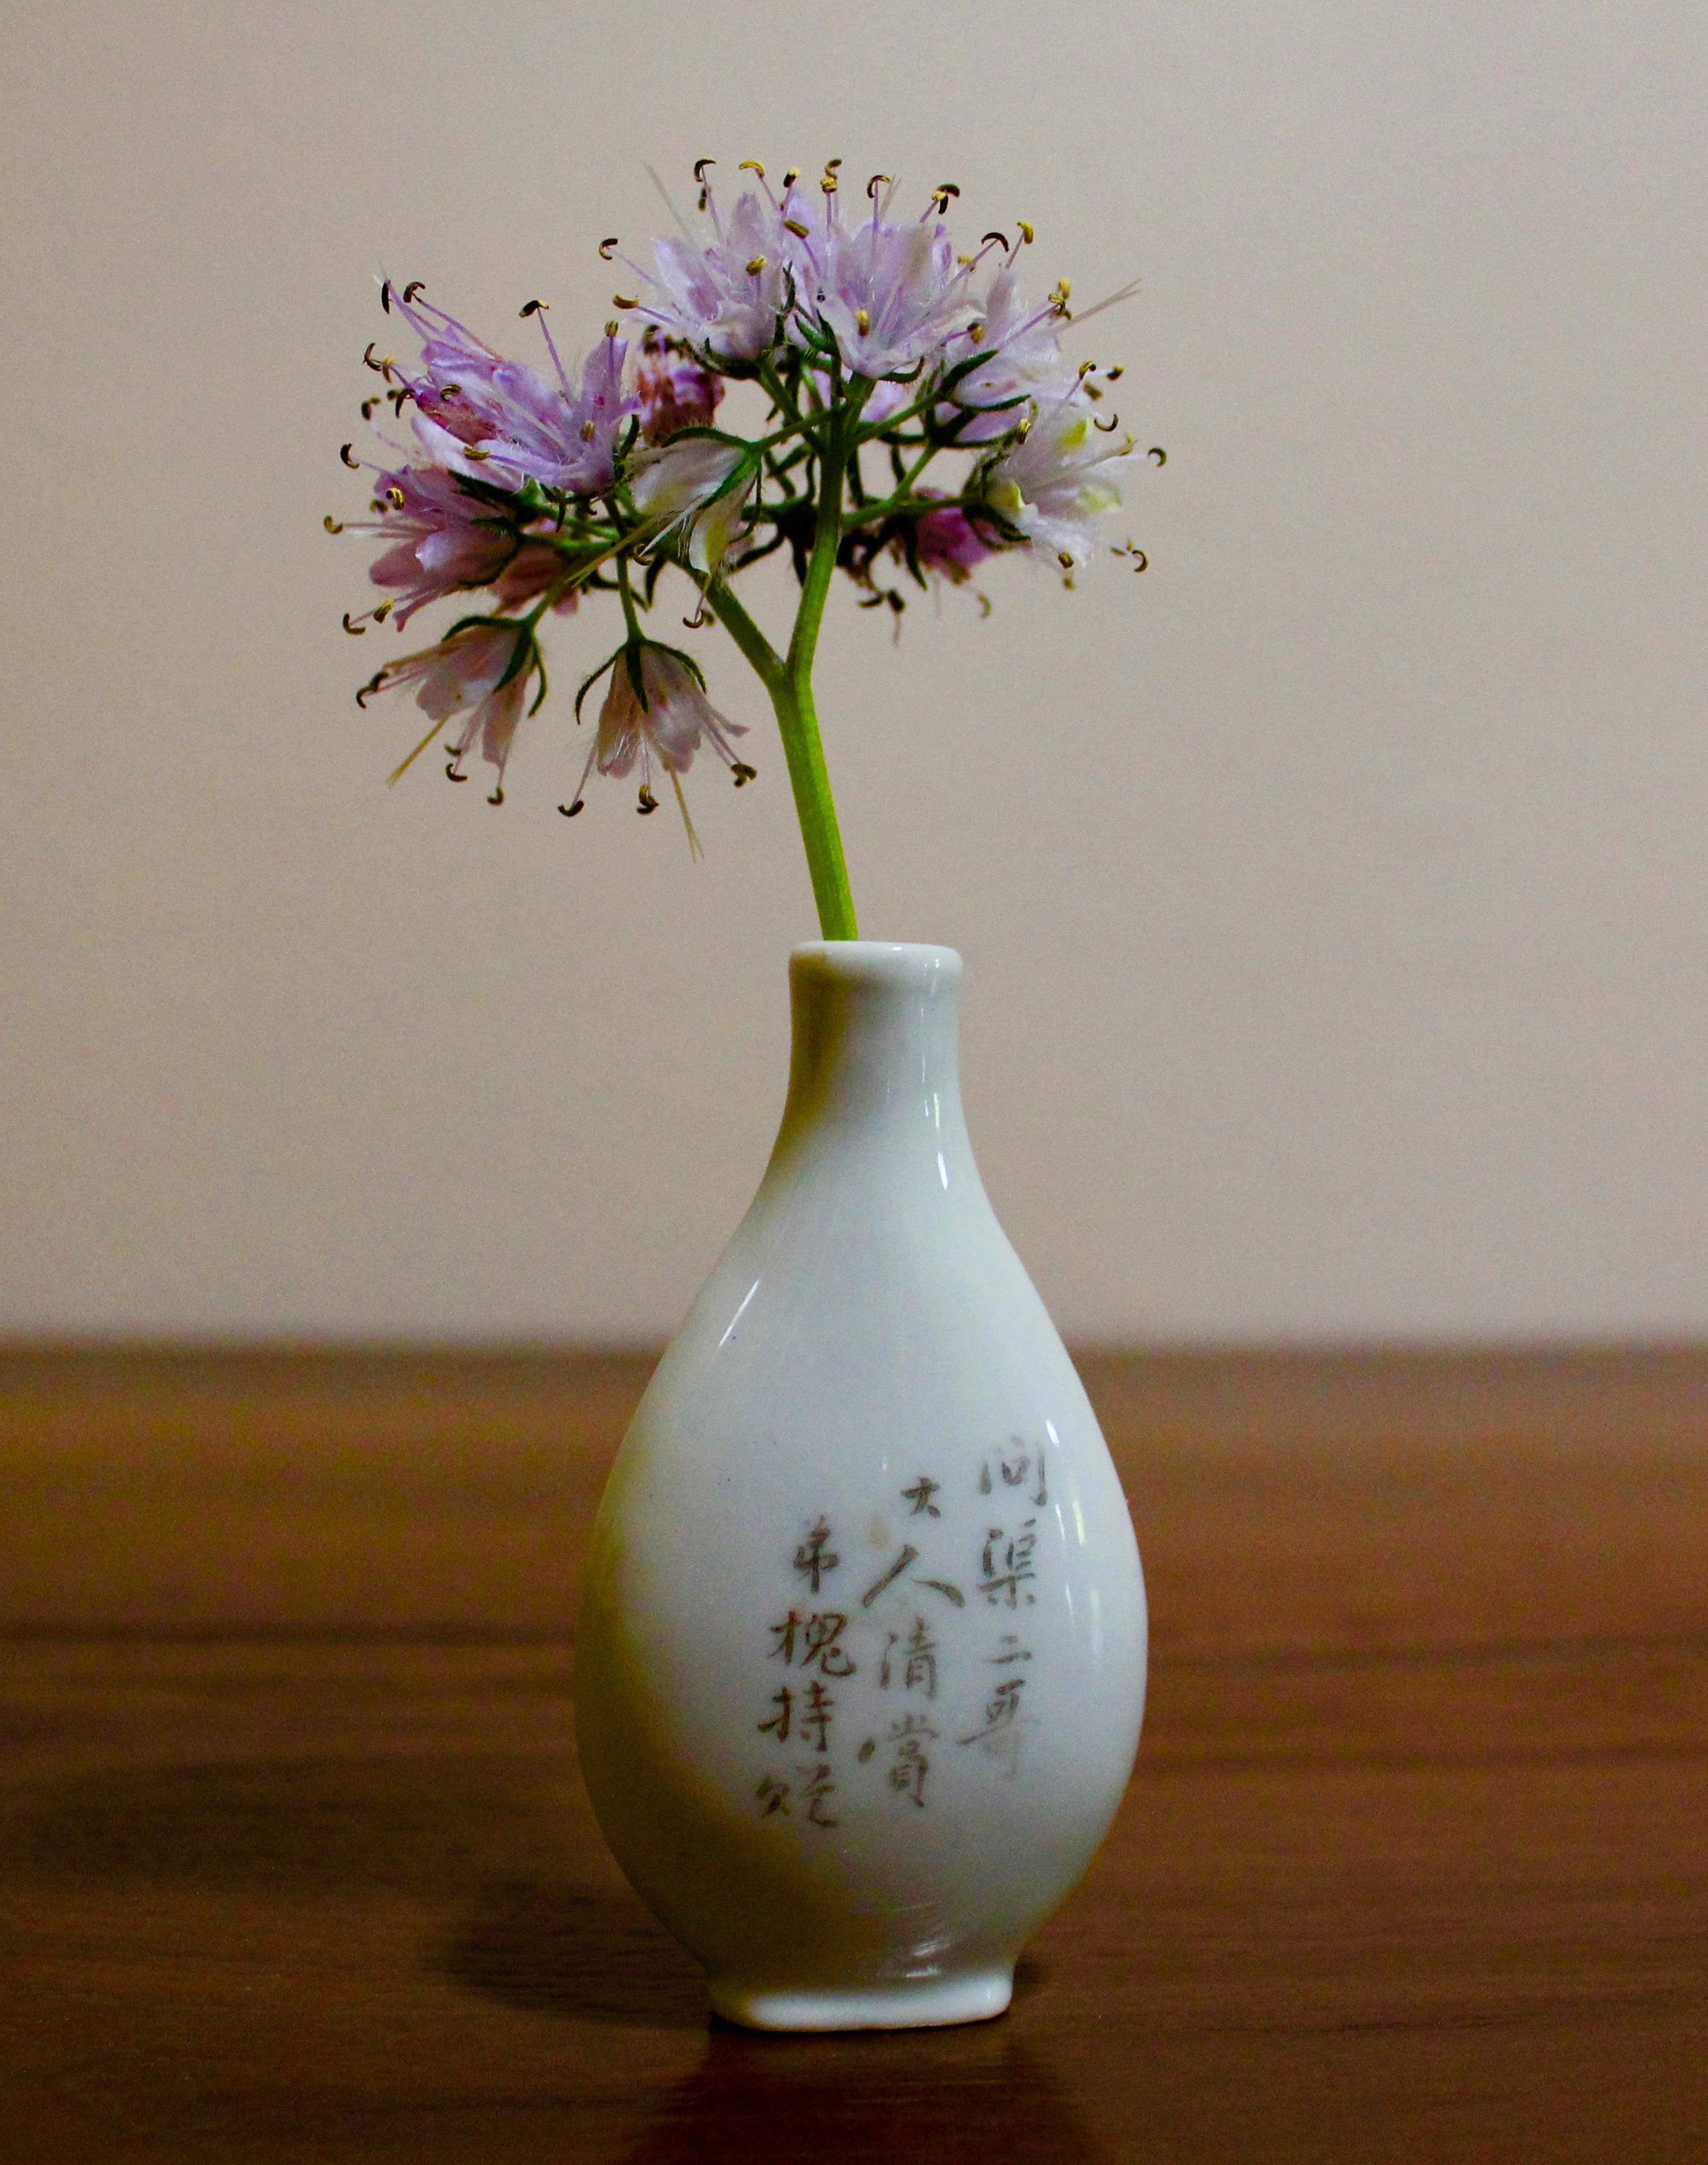 Prairie onion (*Allium stellatum*)